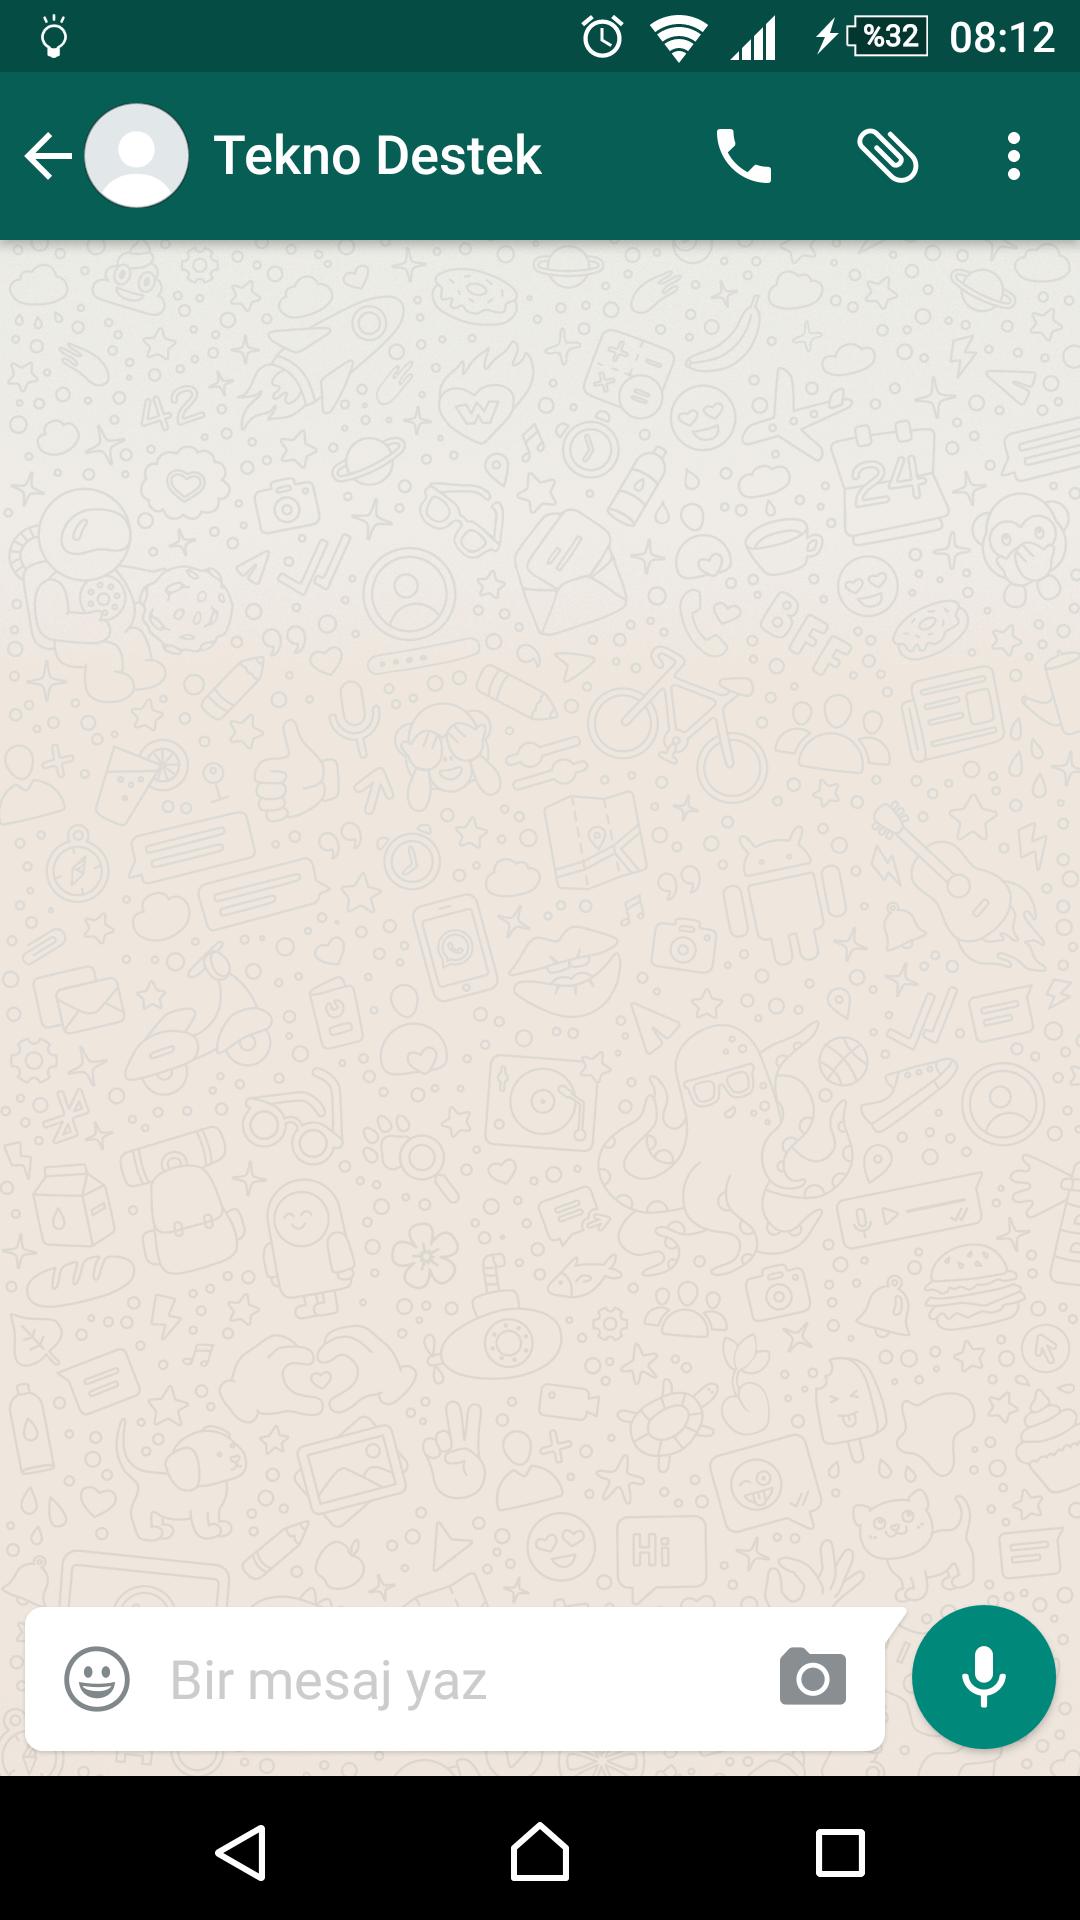 screenshot_20161118-081231